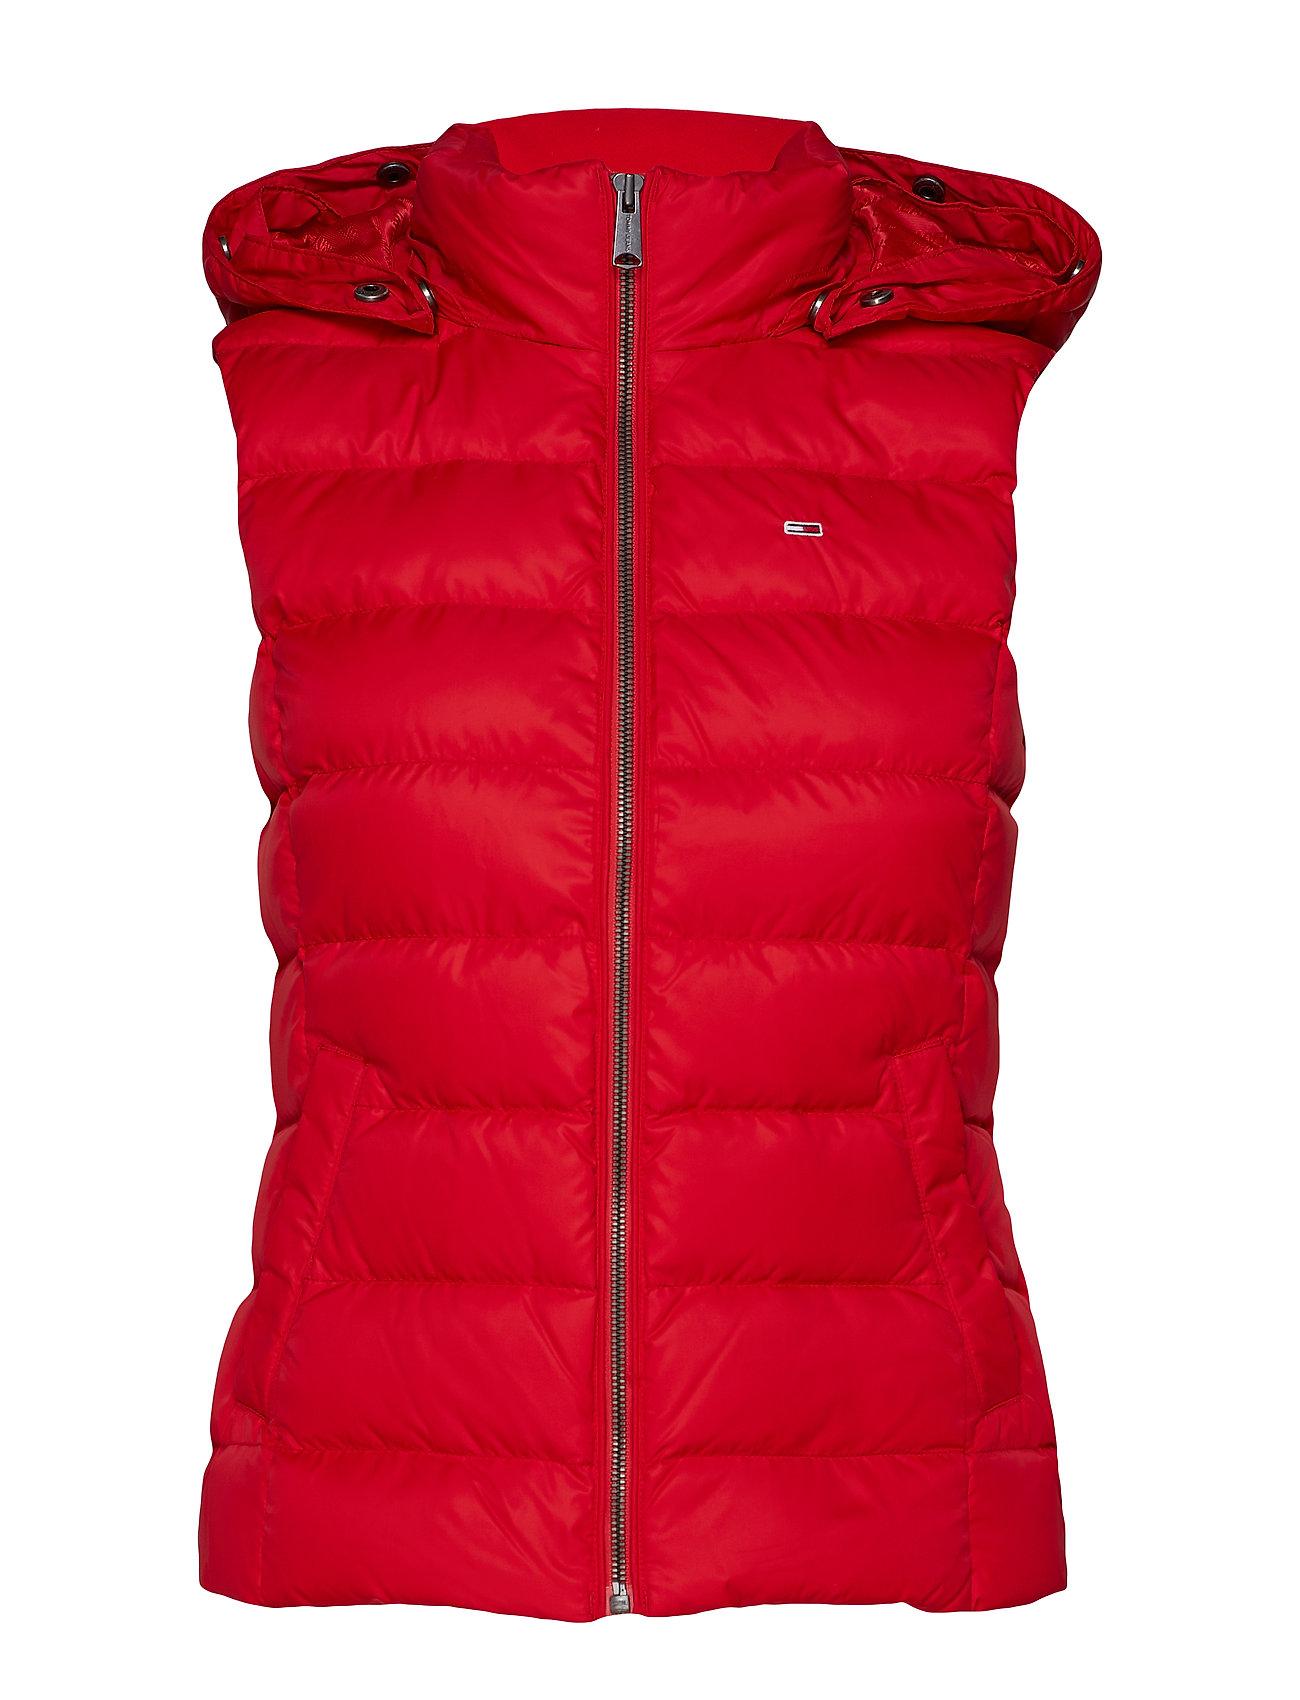 Tjw ScarletTommy Essential Hoodedflame Essential Tjw Jeans FJT1cKl3